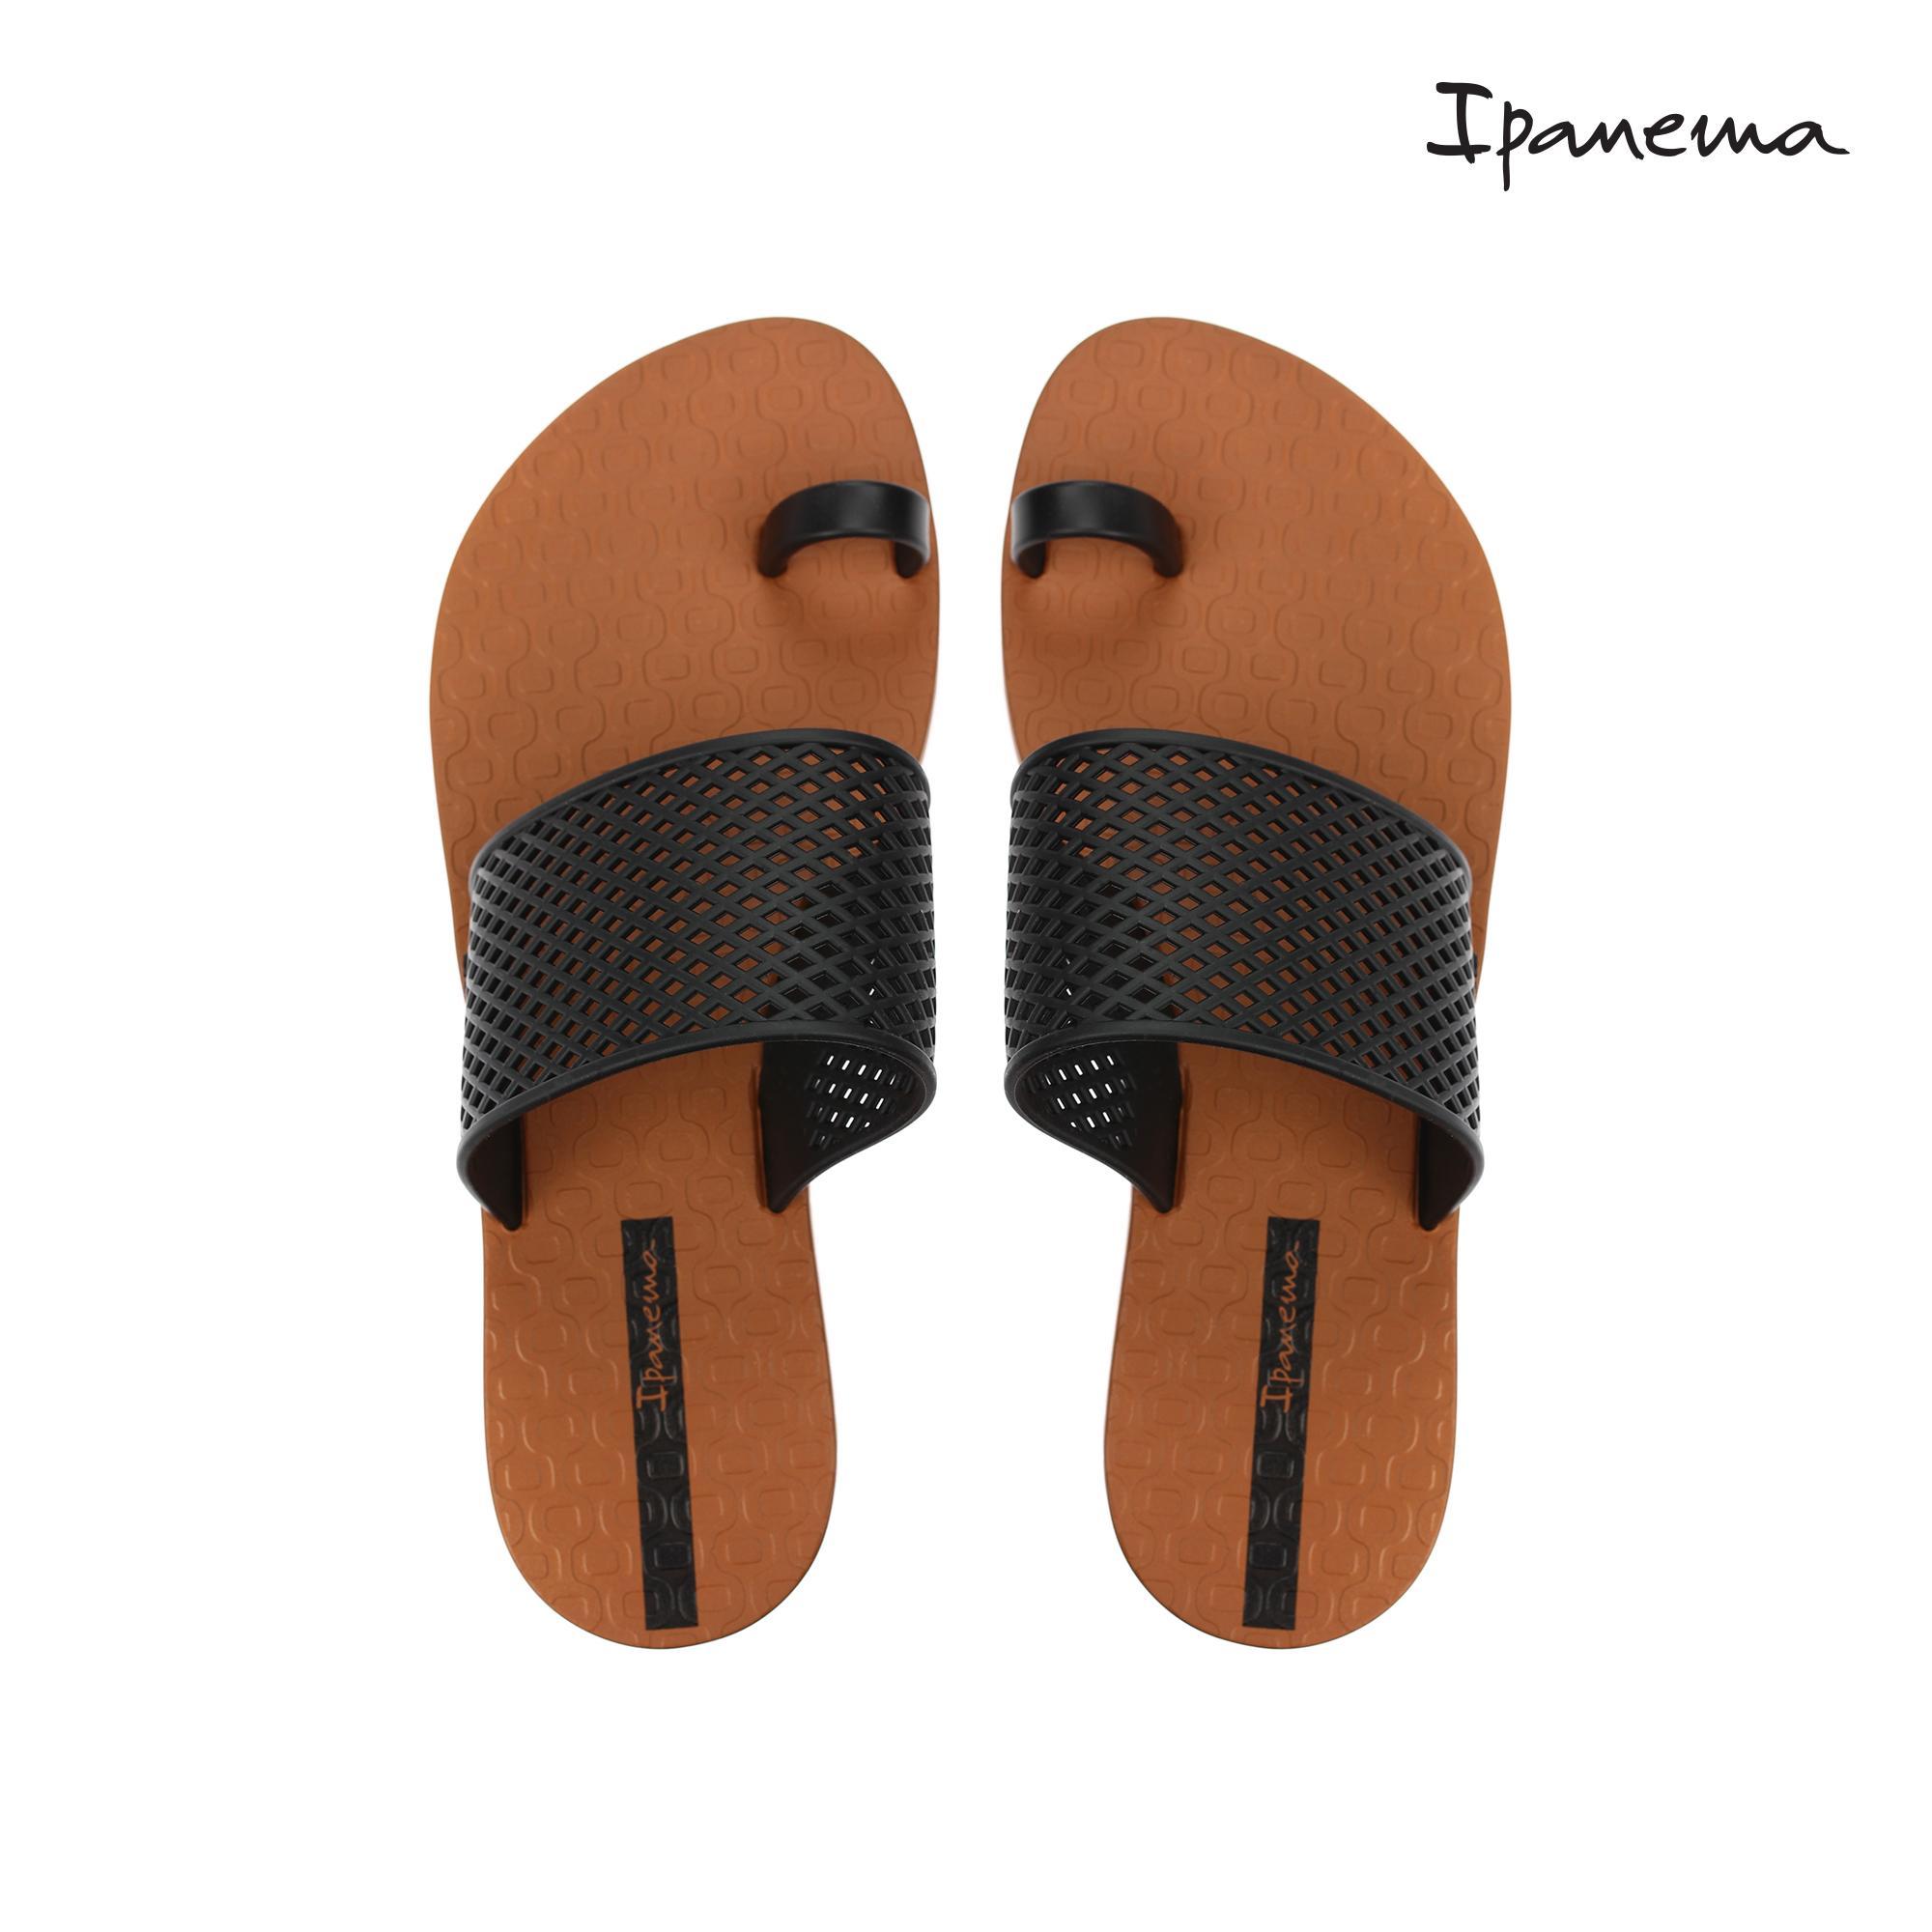 8a4e8724c Ipanema Philippines  Ipanema price list - Ipanema Flip Flop ...